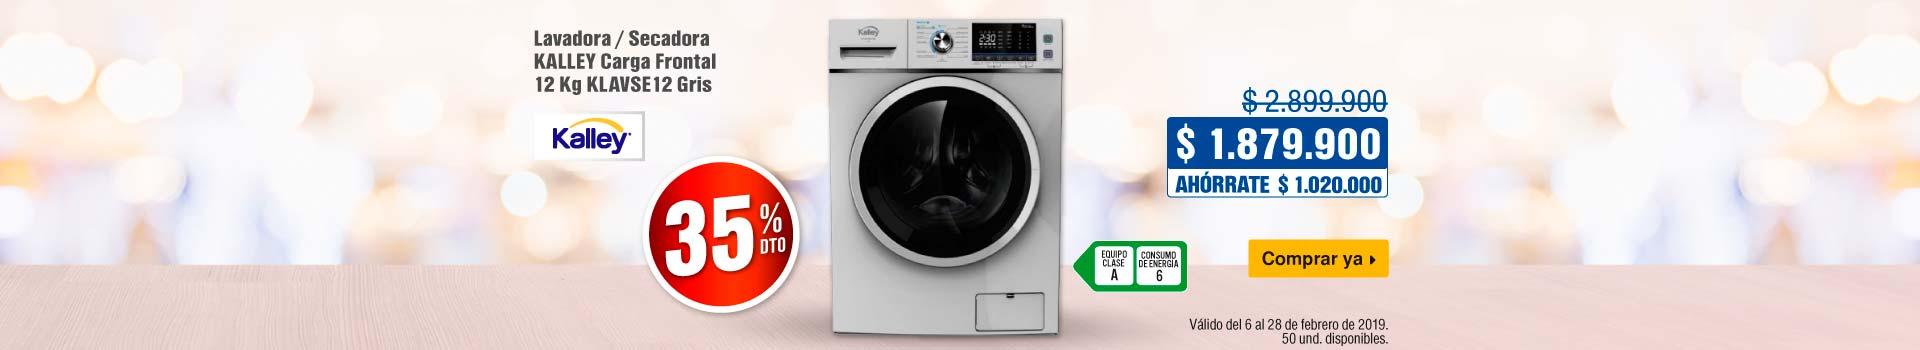 AK-KT-mayores-5-ELECT-BCAT-lavadoras-050219